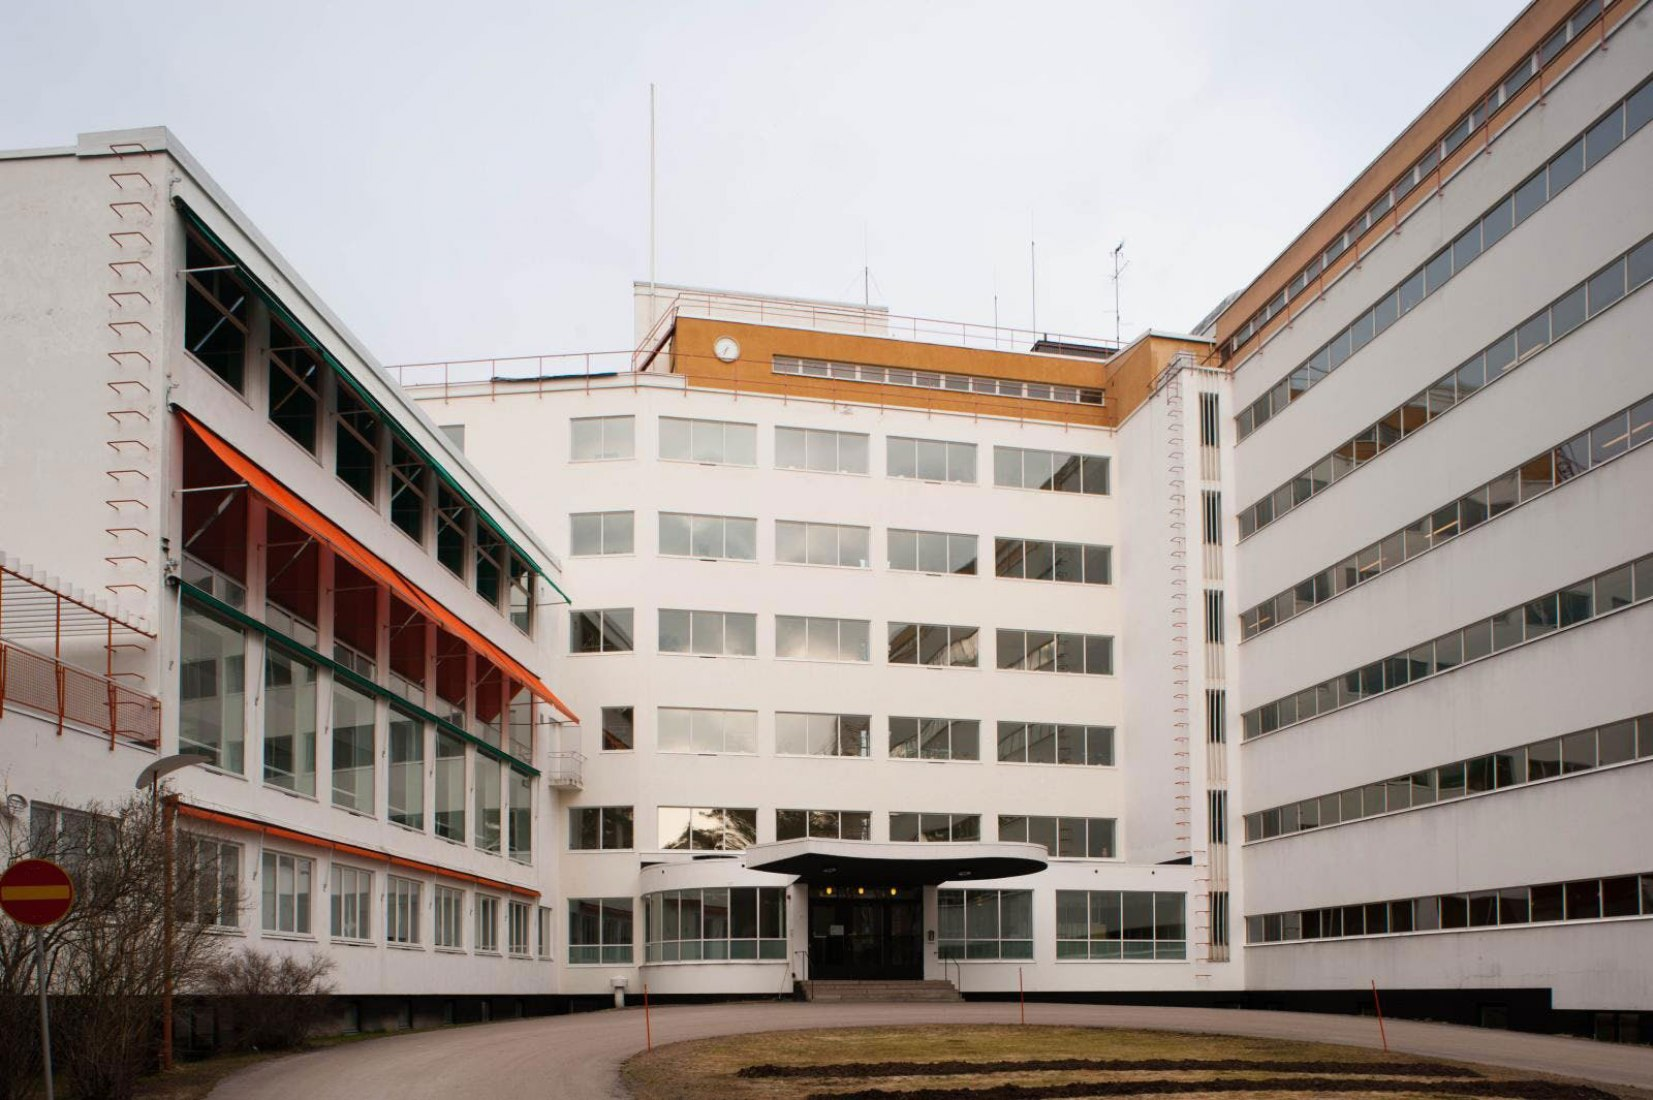 Vista exterior. Sanatorio Paimio por Alvar Aalto, 1933, Situado en Paimio, Finlandia. Imagen: Leon/Flickr